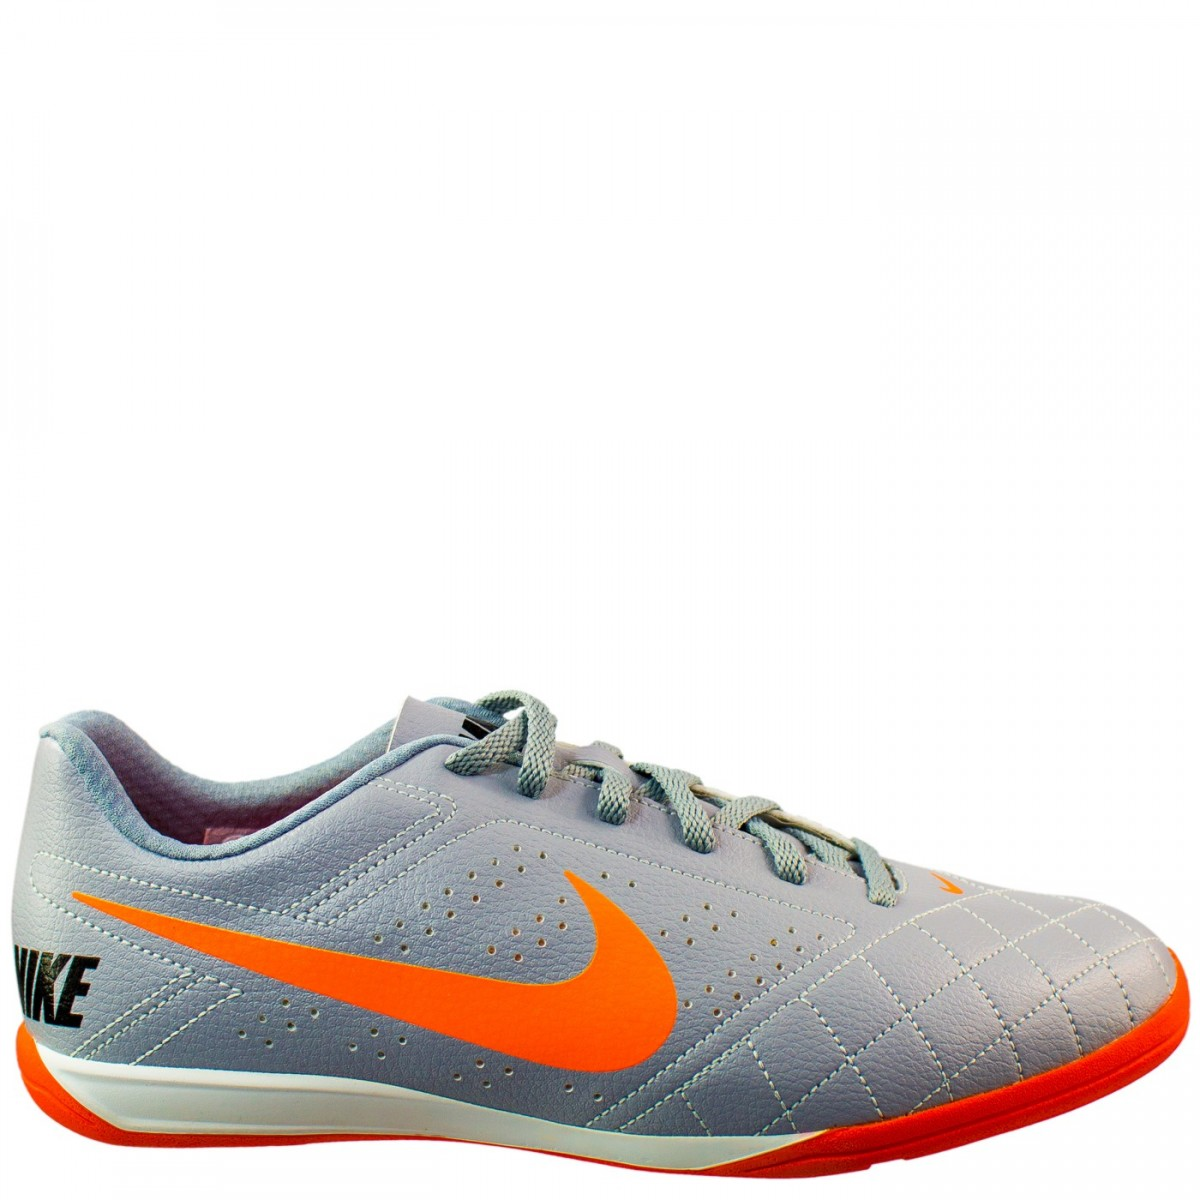 65fea4e556 Bizz Store - Chuteira Para Futsal Nike Beco 2 Masculina 646433